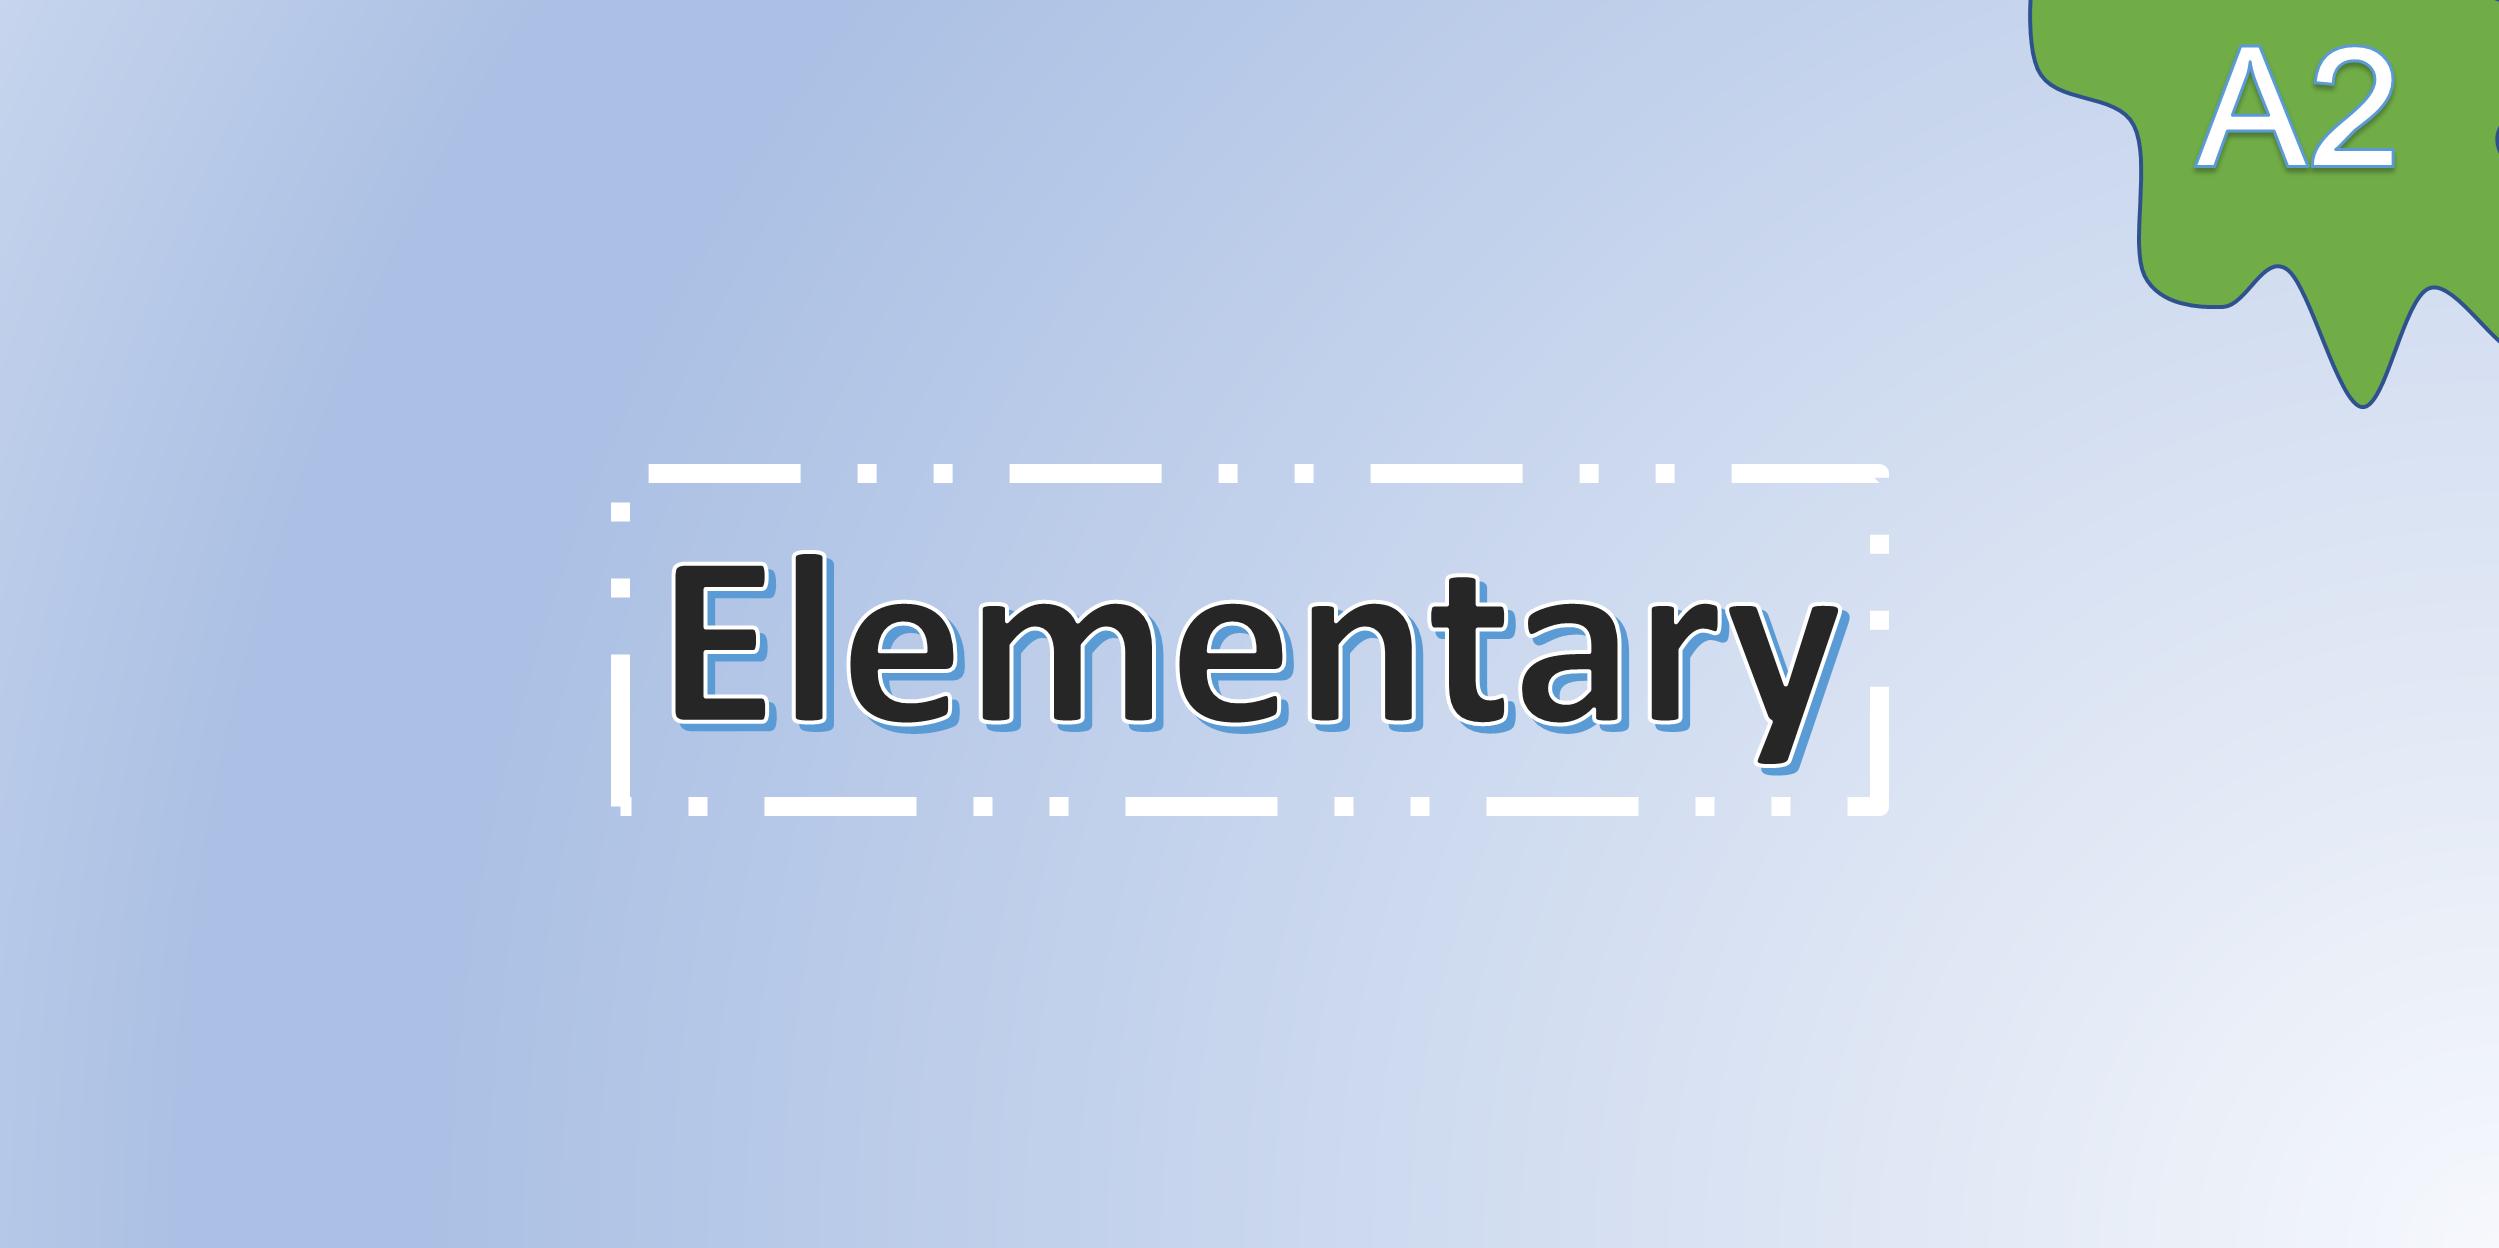 Elementary (A2)